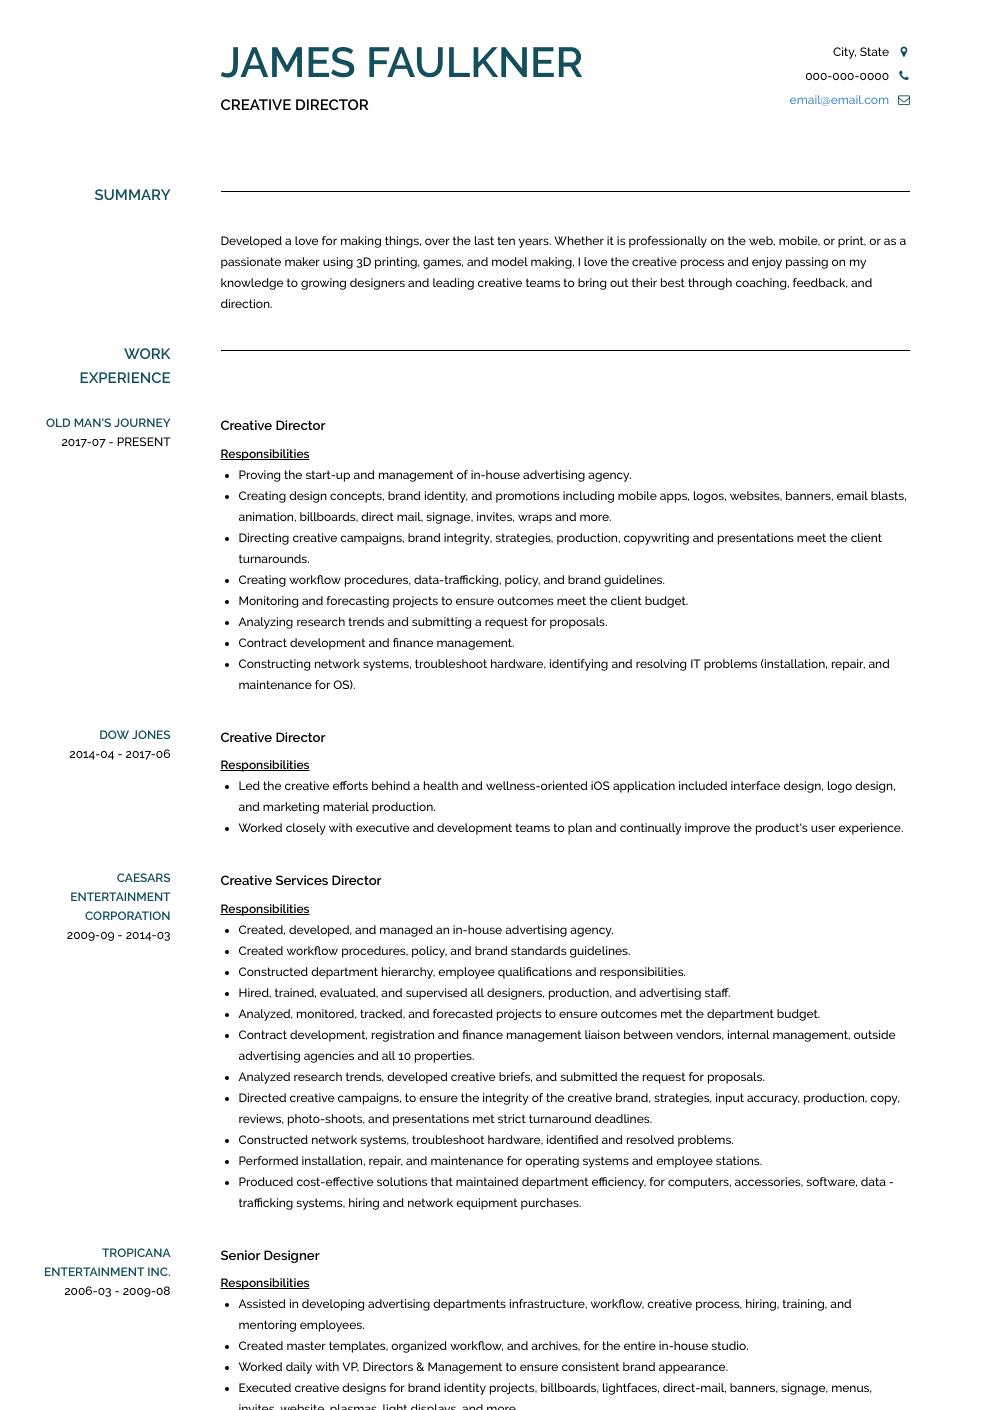 Creative Director Resume Samples And Templates Visualcv Creative Director Cv Creative Director Current Job